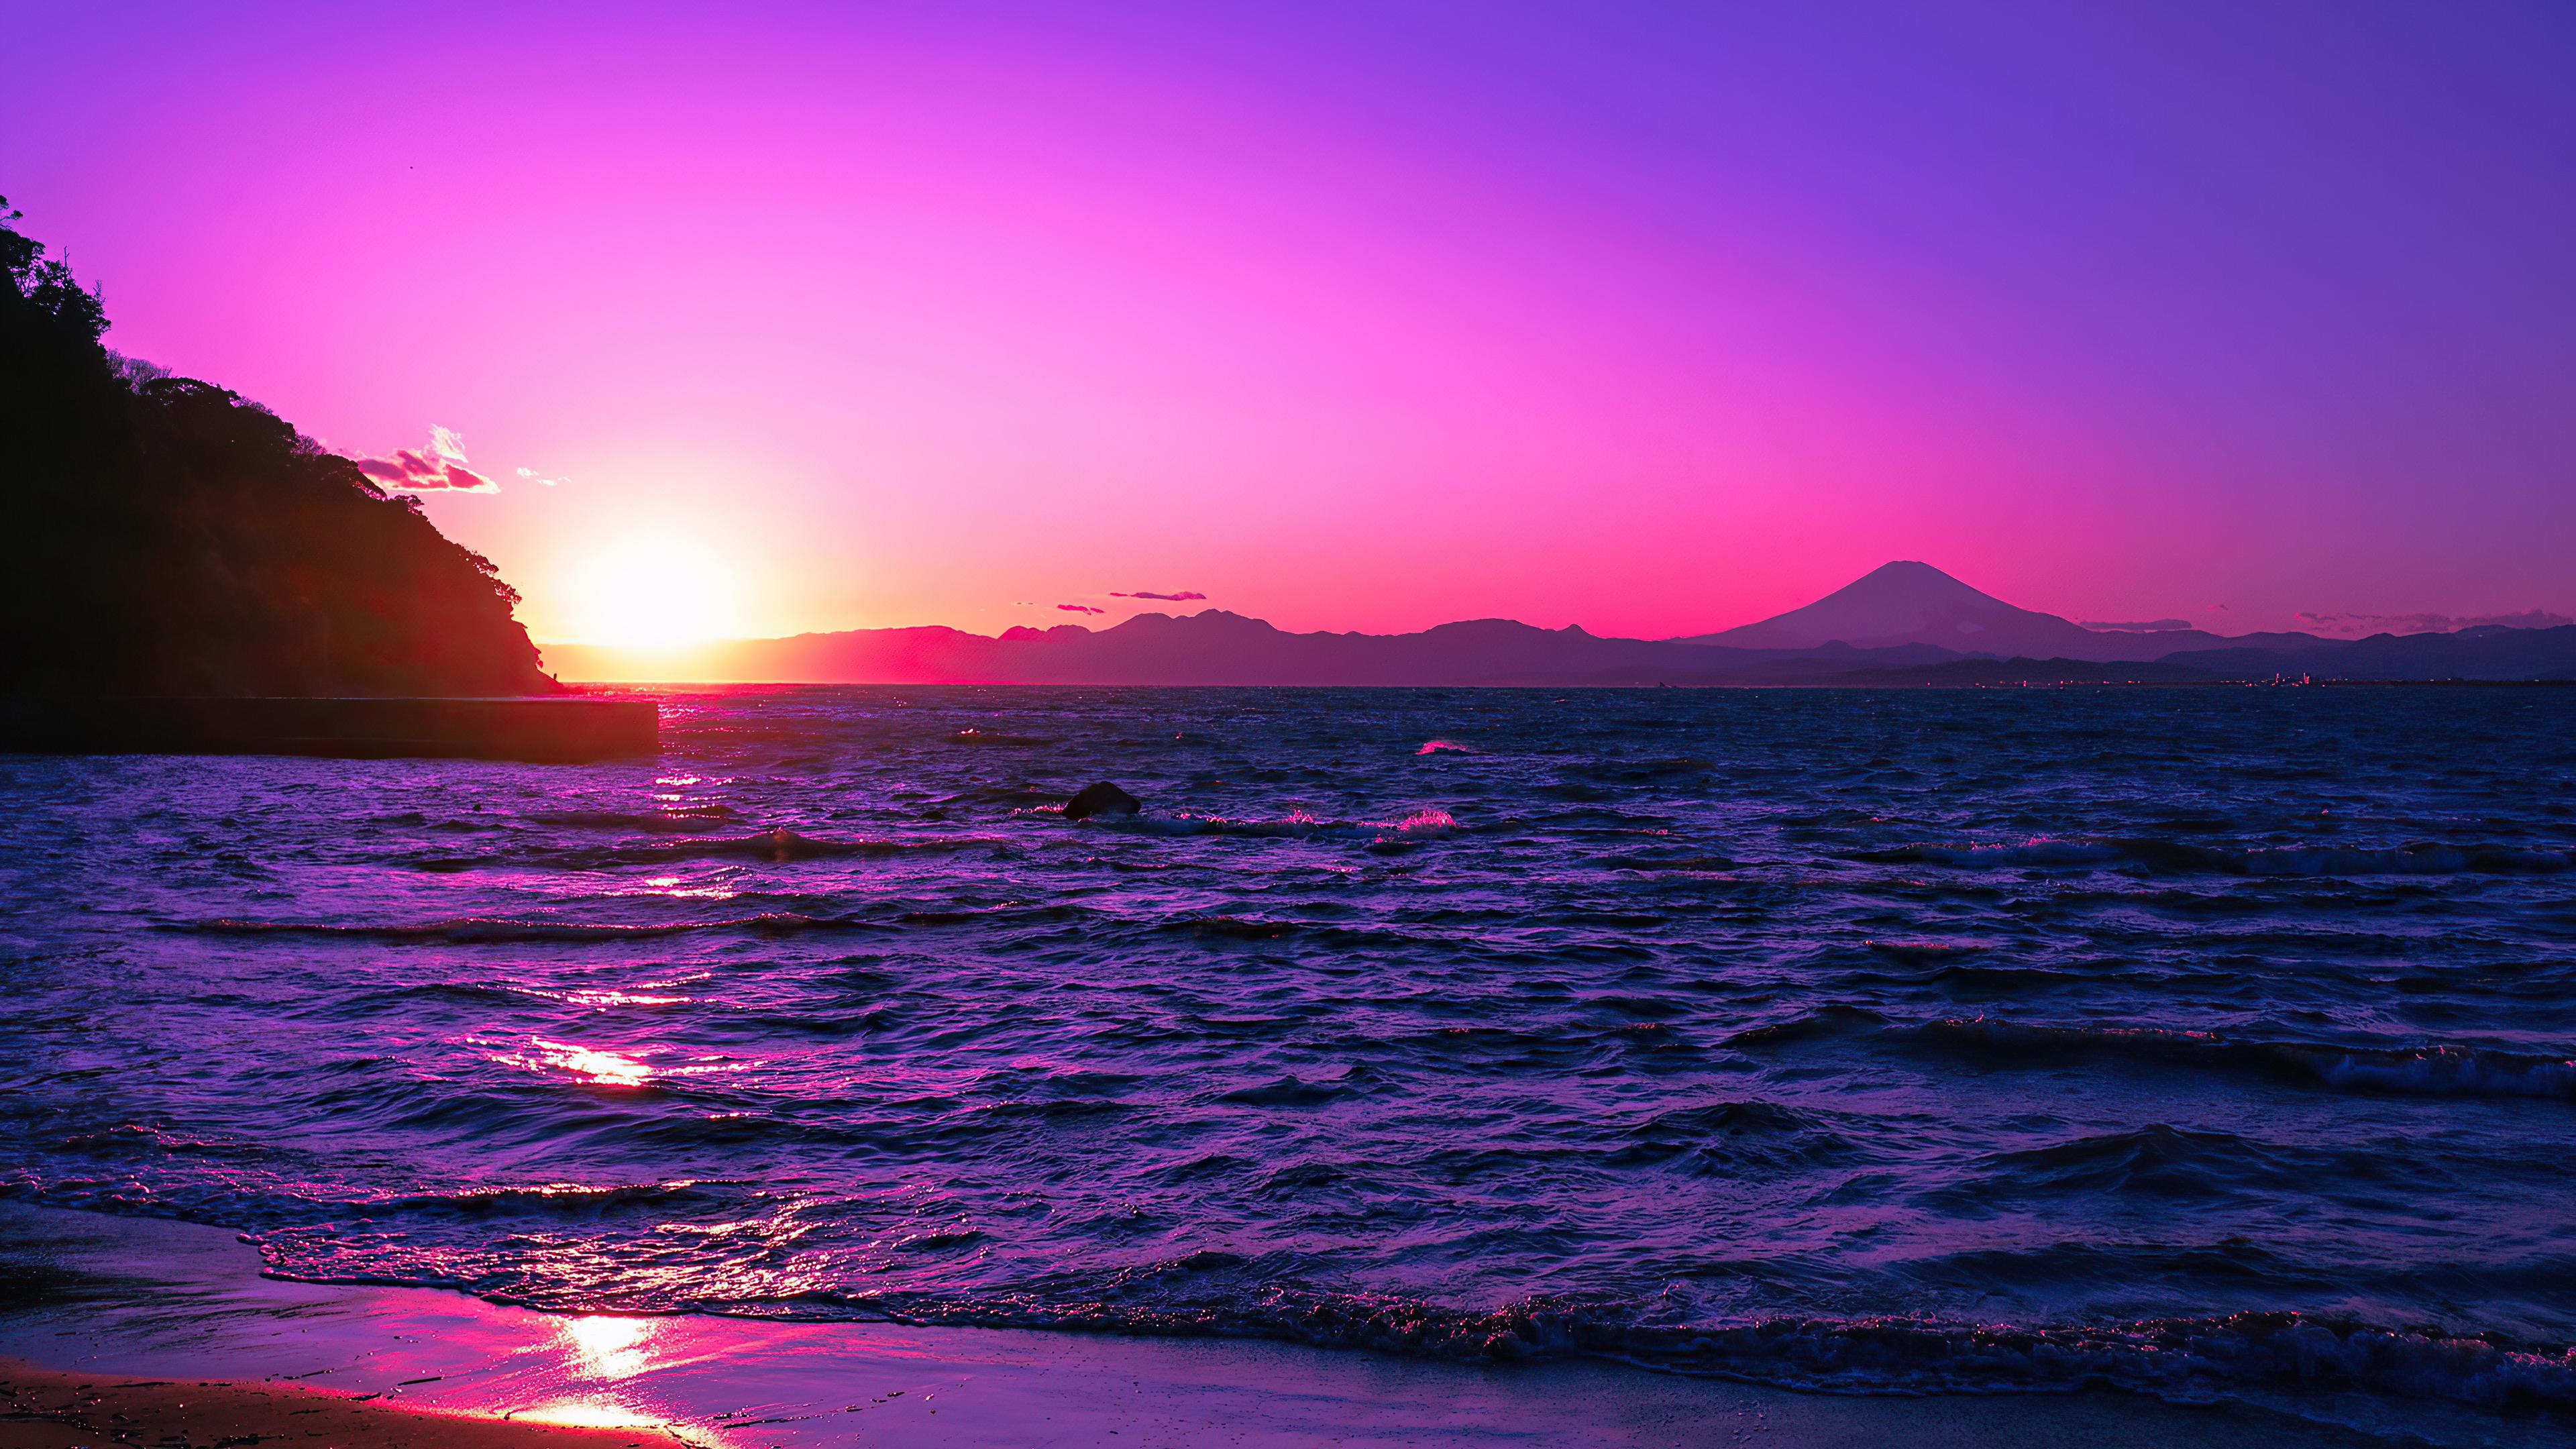 beautiful evening purple sunset 4k 1602533719 - Beautiful Evening Purple Sunset 4k - Beautiful Evening Purple Sunset 4k wallpapers